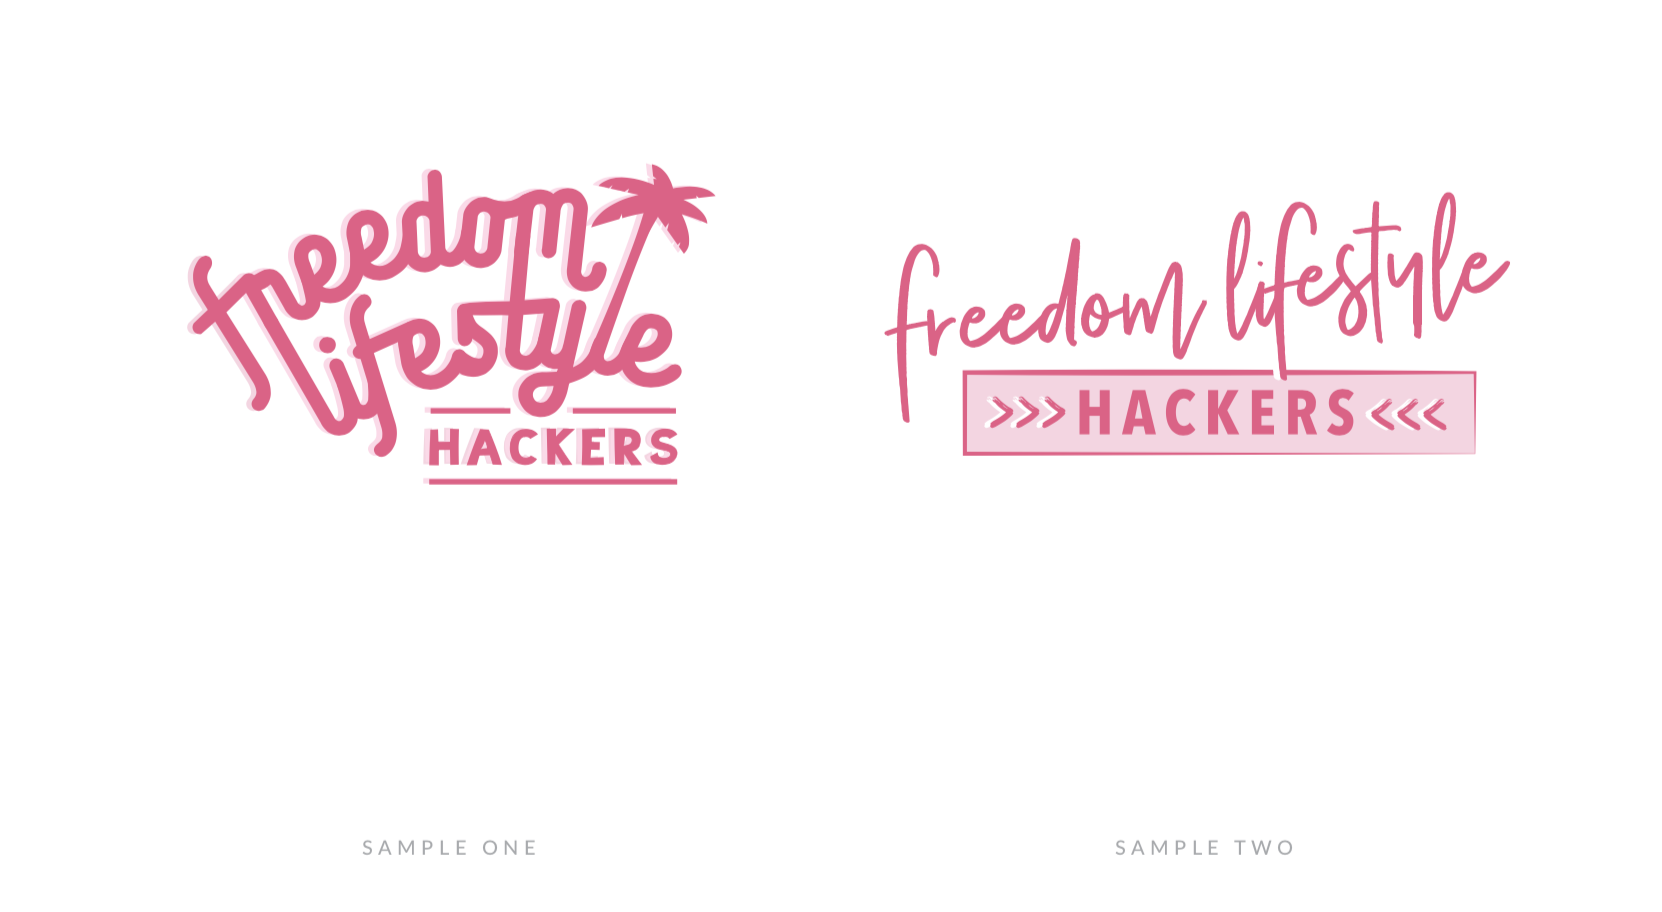 Freedom Lifestyle Brand - KH Creative